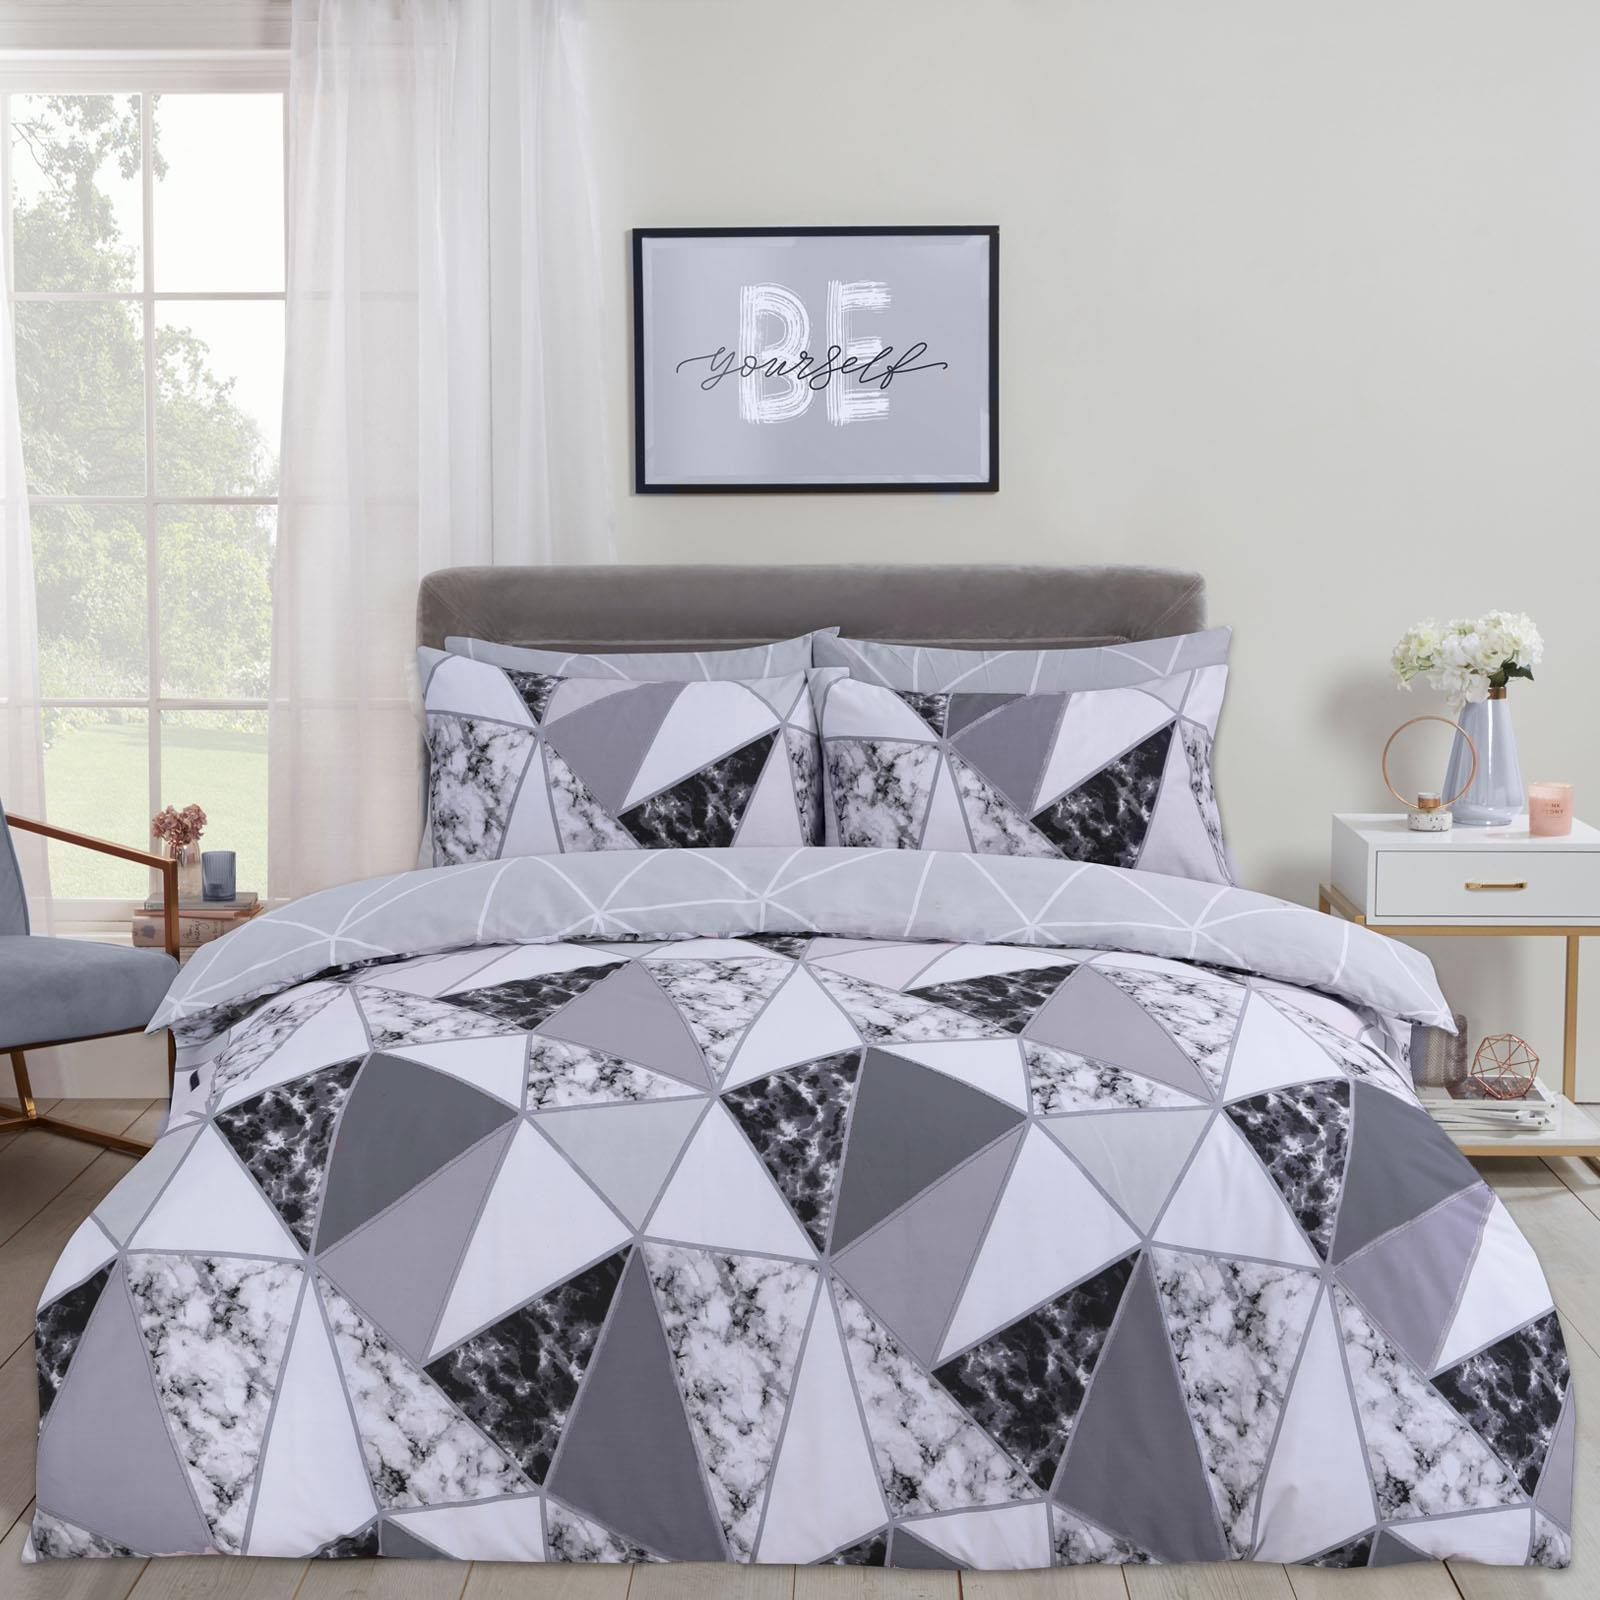 thumbnail 10 - Dreamscene Marble Geometric Duvet Cover with Pillowcase Bedding Set Grey Blush